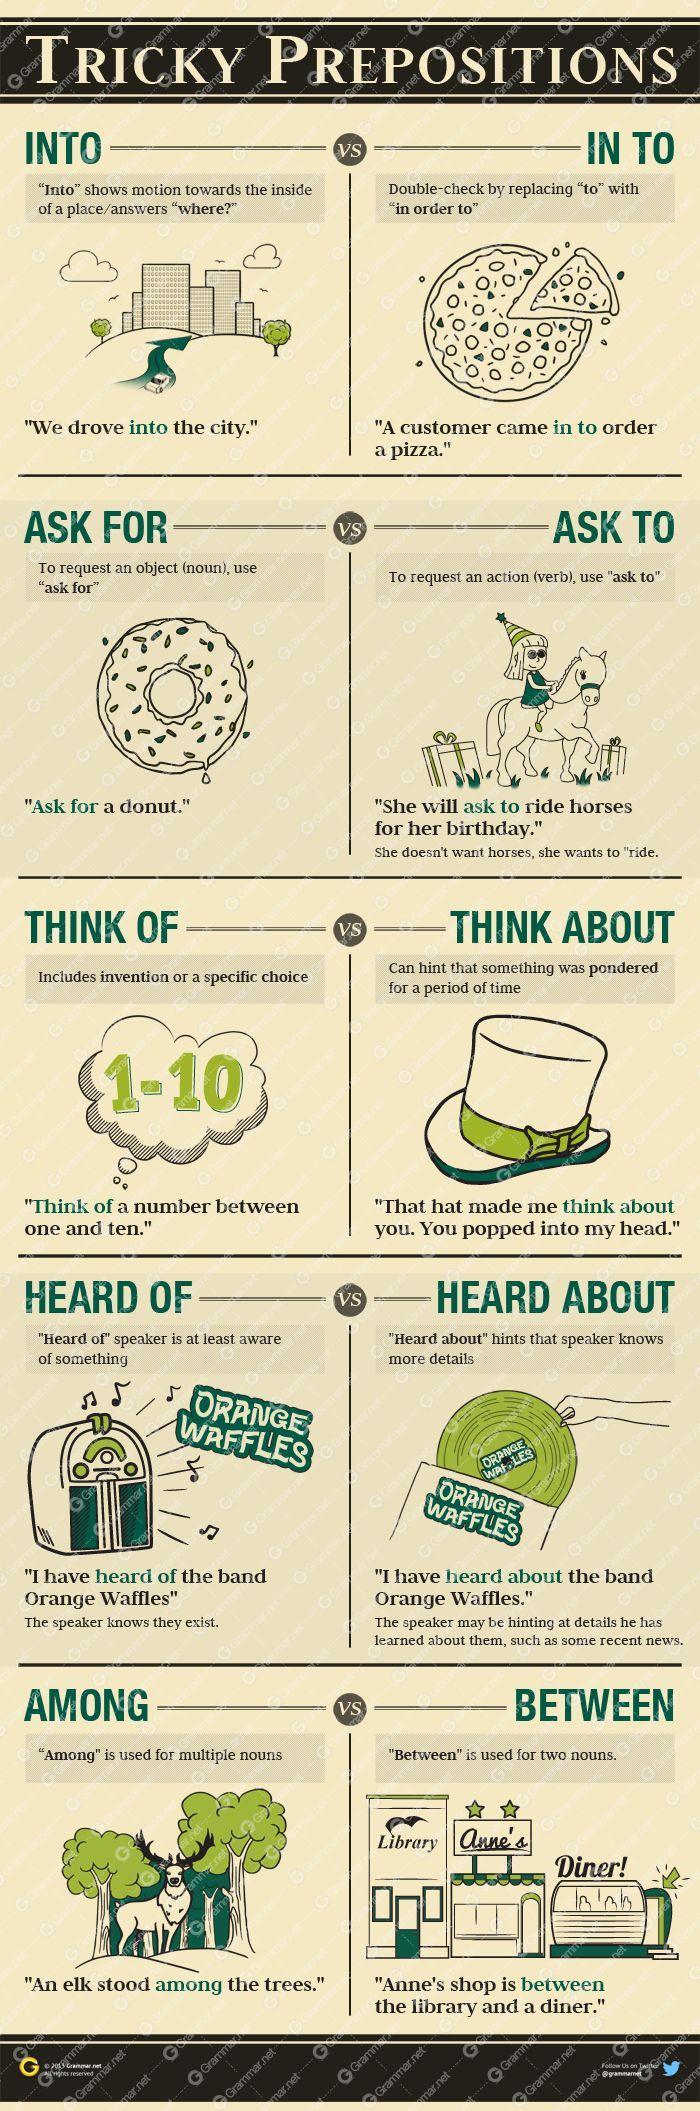 Aprende inglés: preposiciones difíciles #infografia #infographic #education